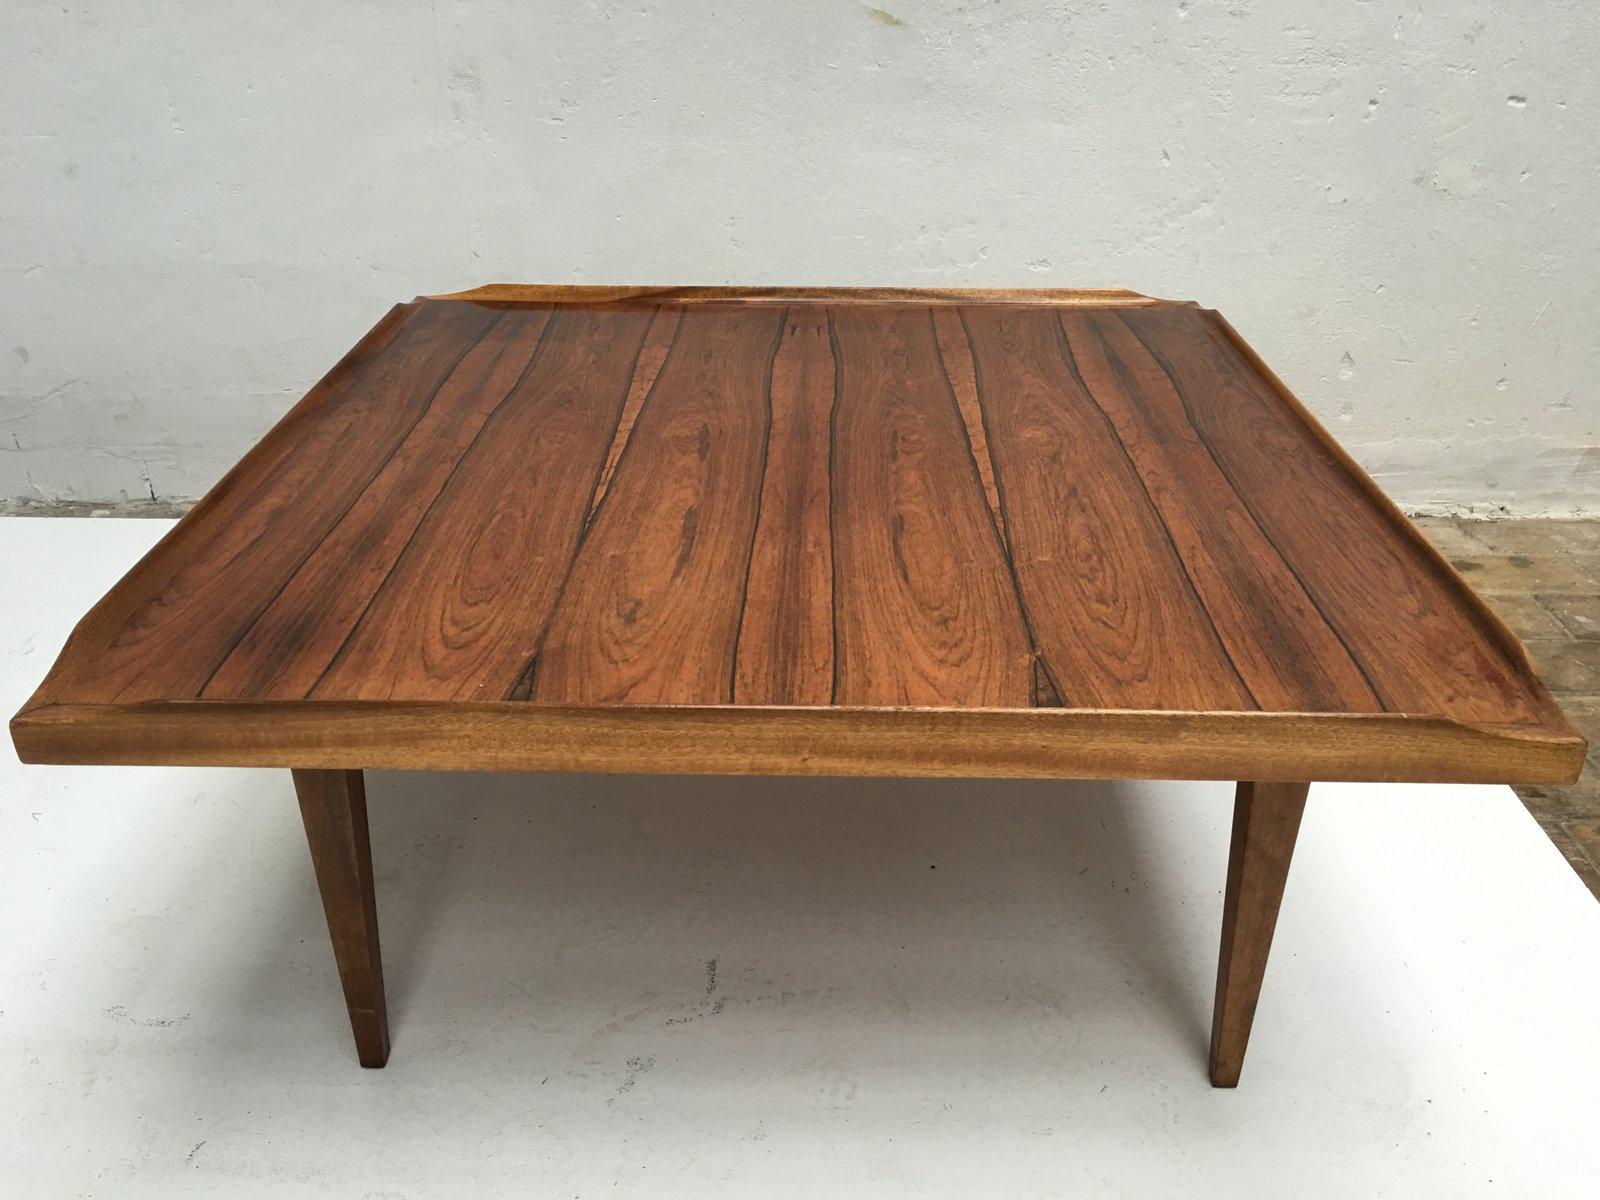 table basse carr e en palissandre danemark 1960s en vente sur pamono. Black Bedroom Furniture Sets. Home Design Ideas